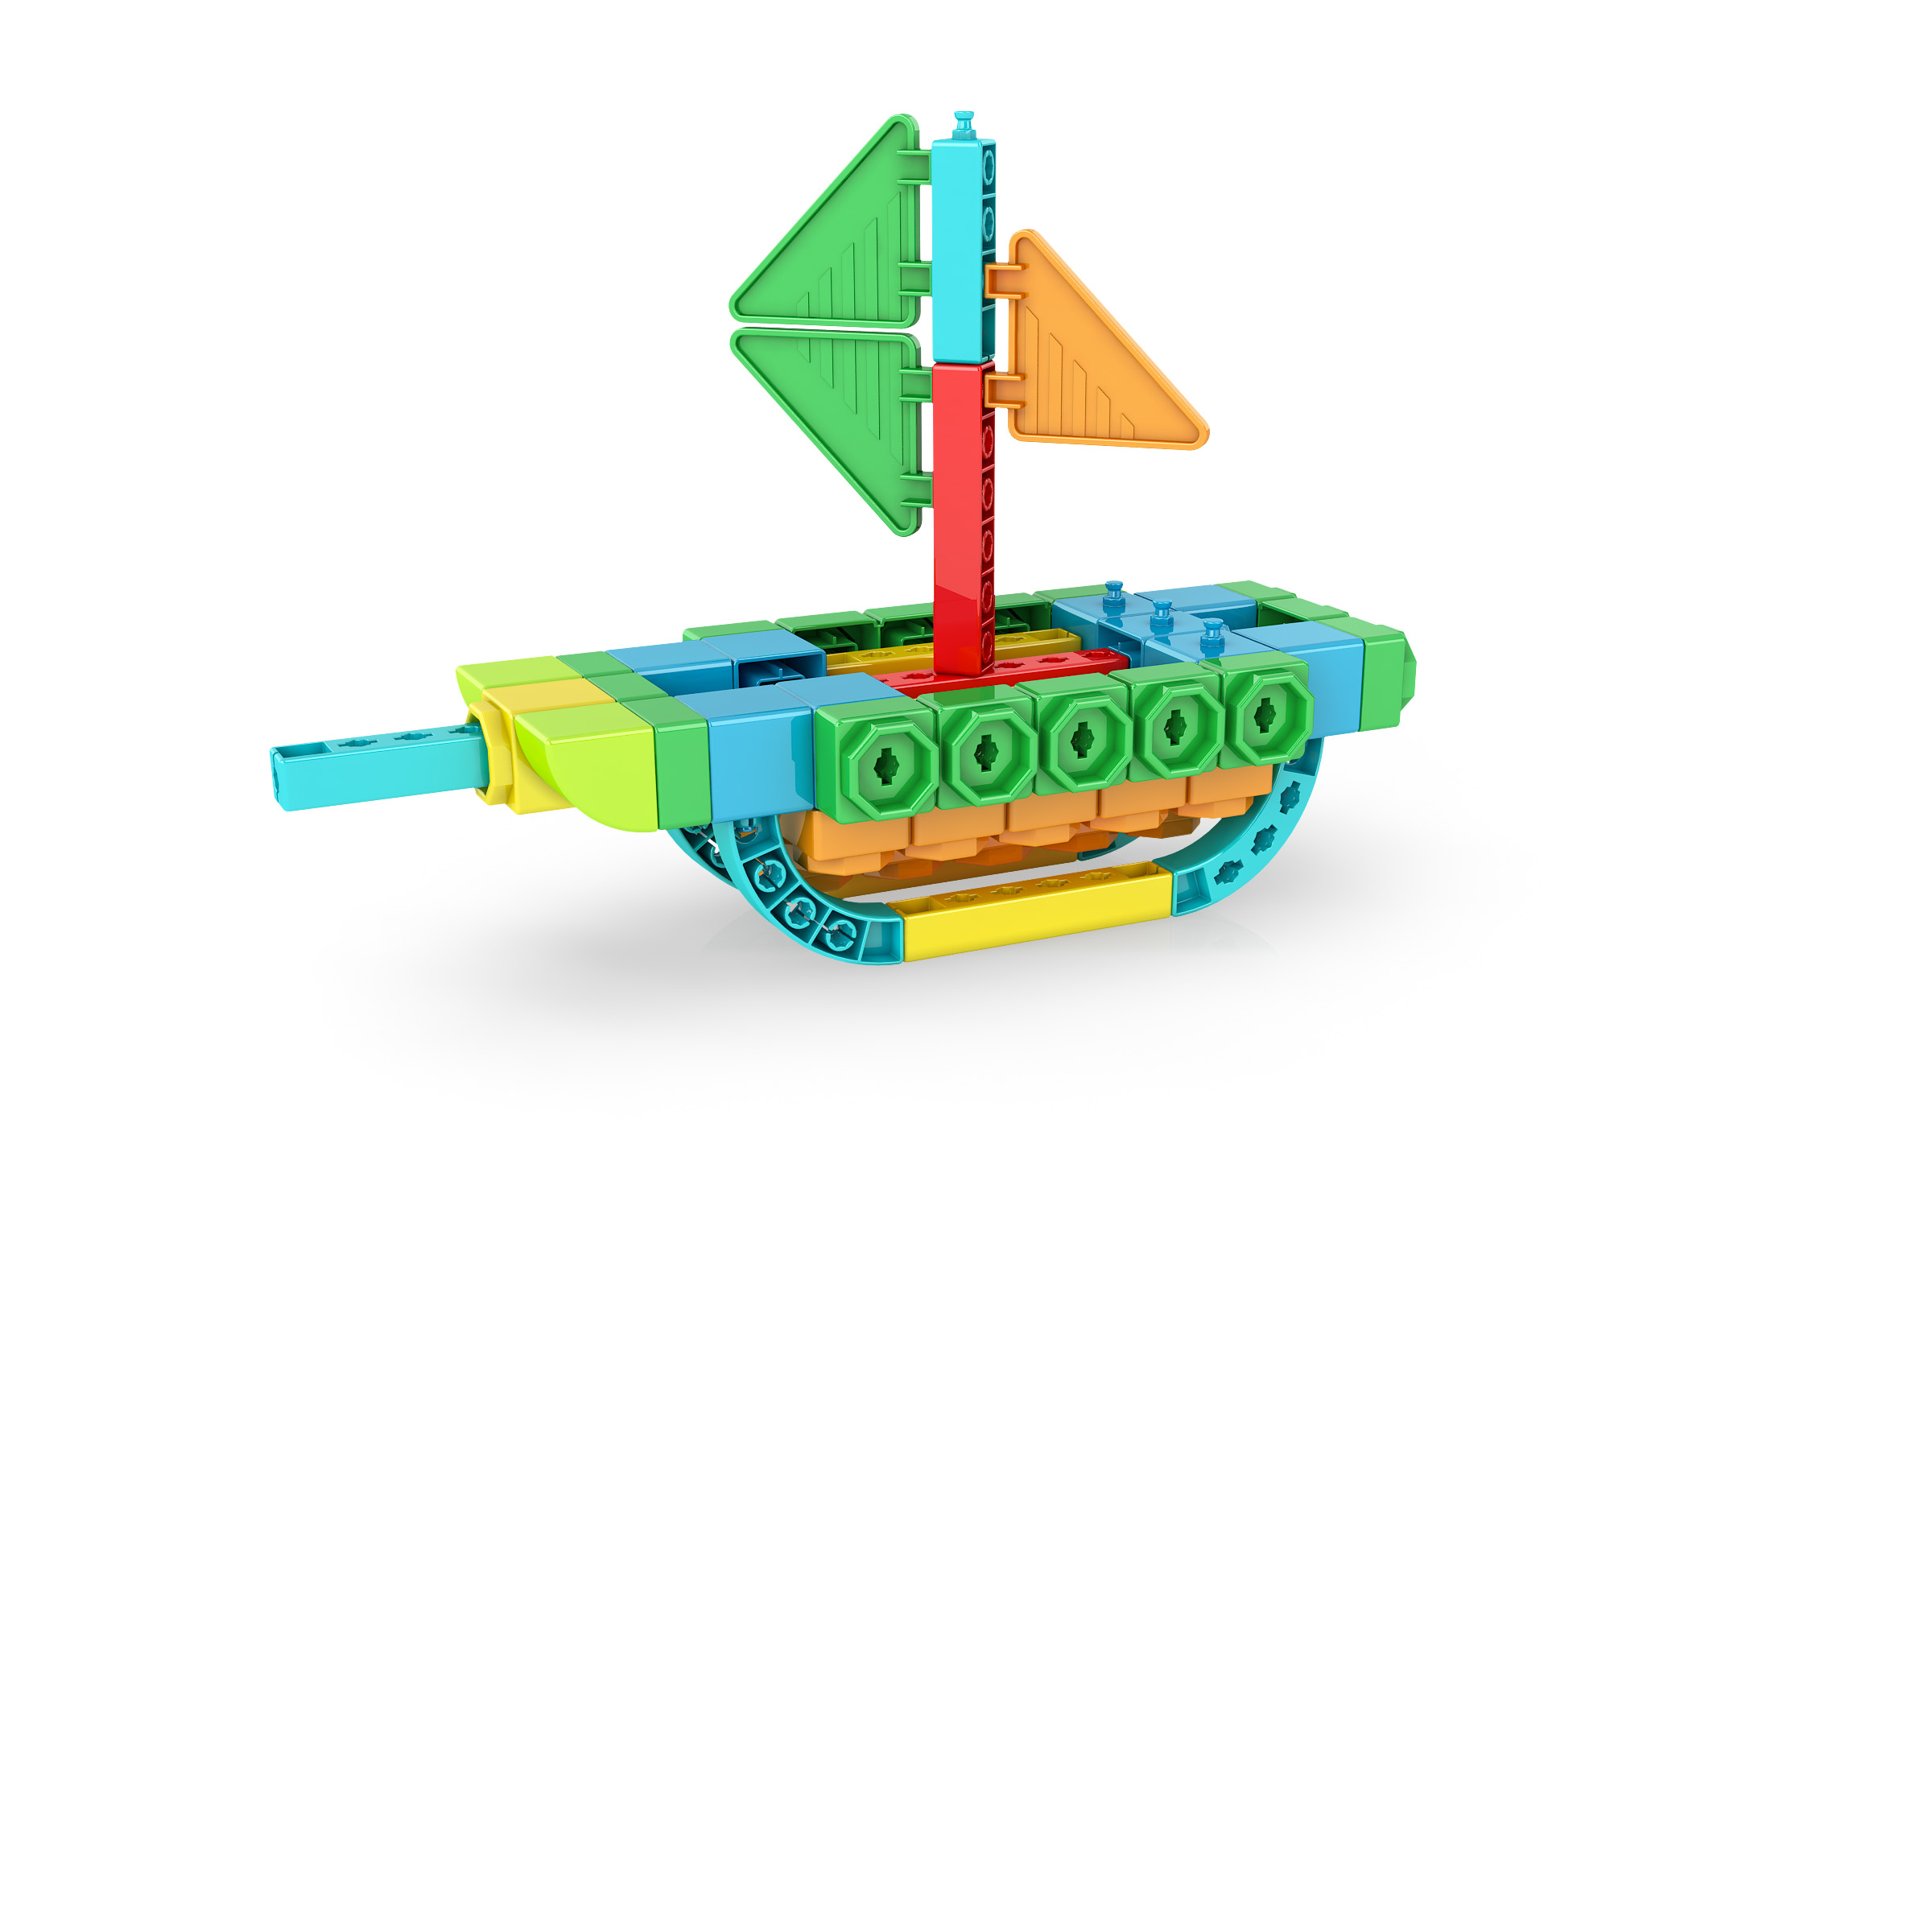 , PiratesShip, משחקים לגיל הרך playgro, משחקי קופסא engino, משחק הרכבות אנג'ינו, משחקי רכבות